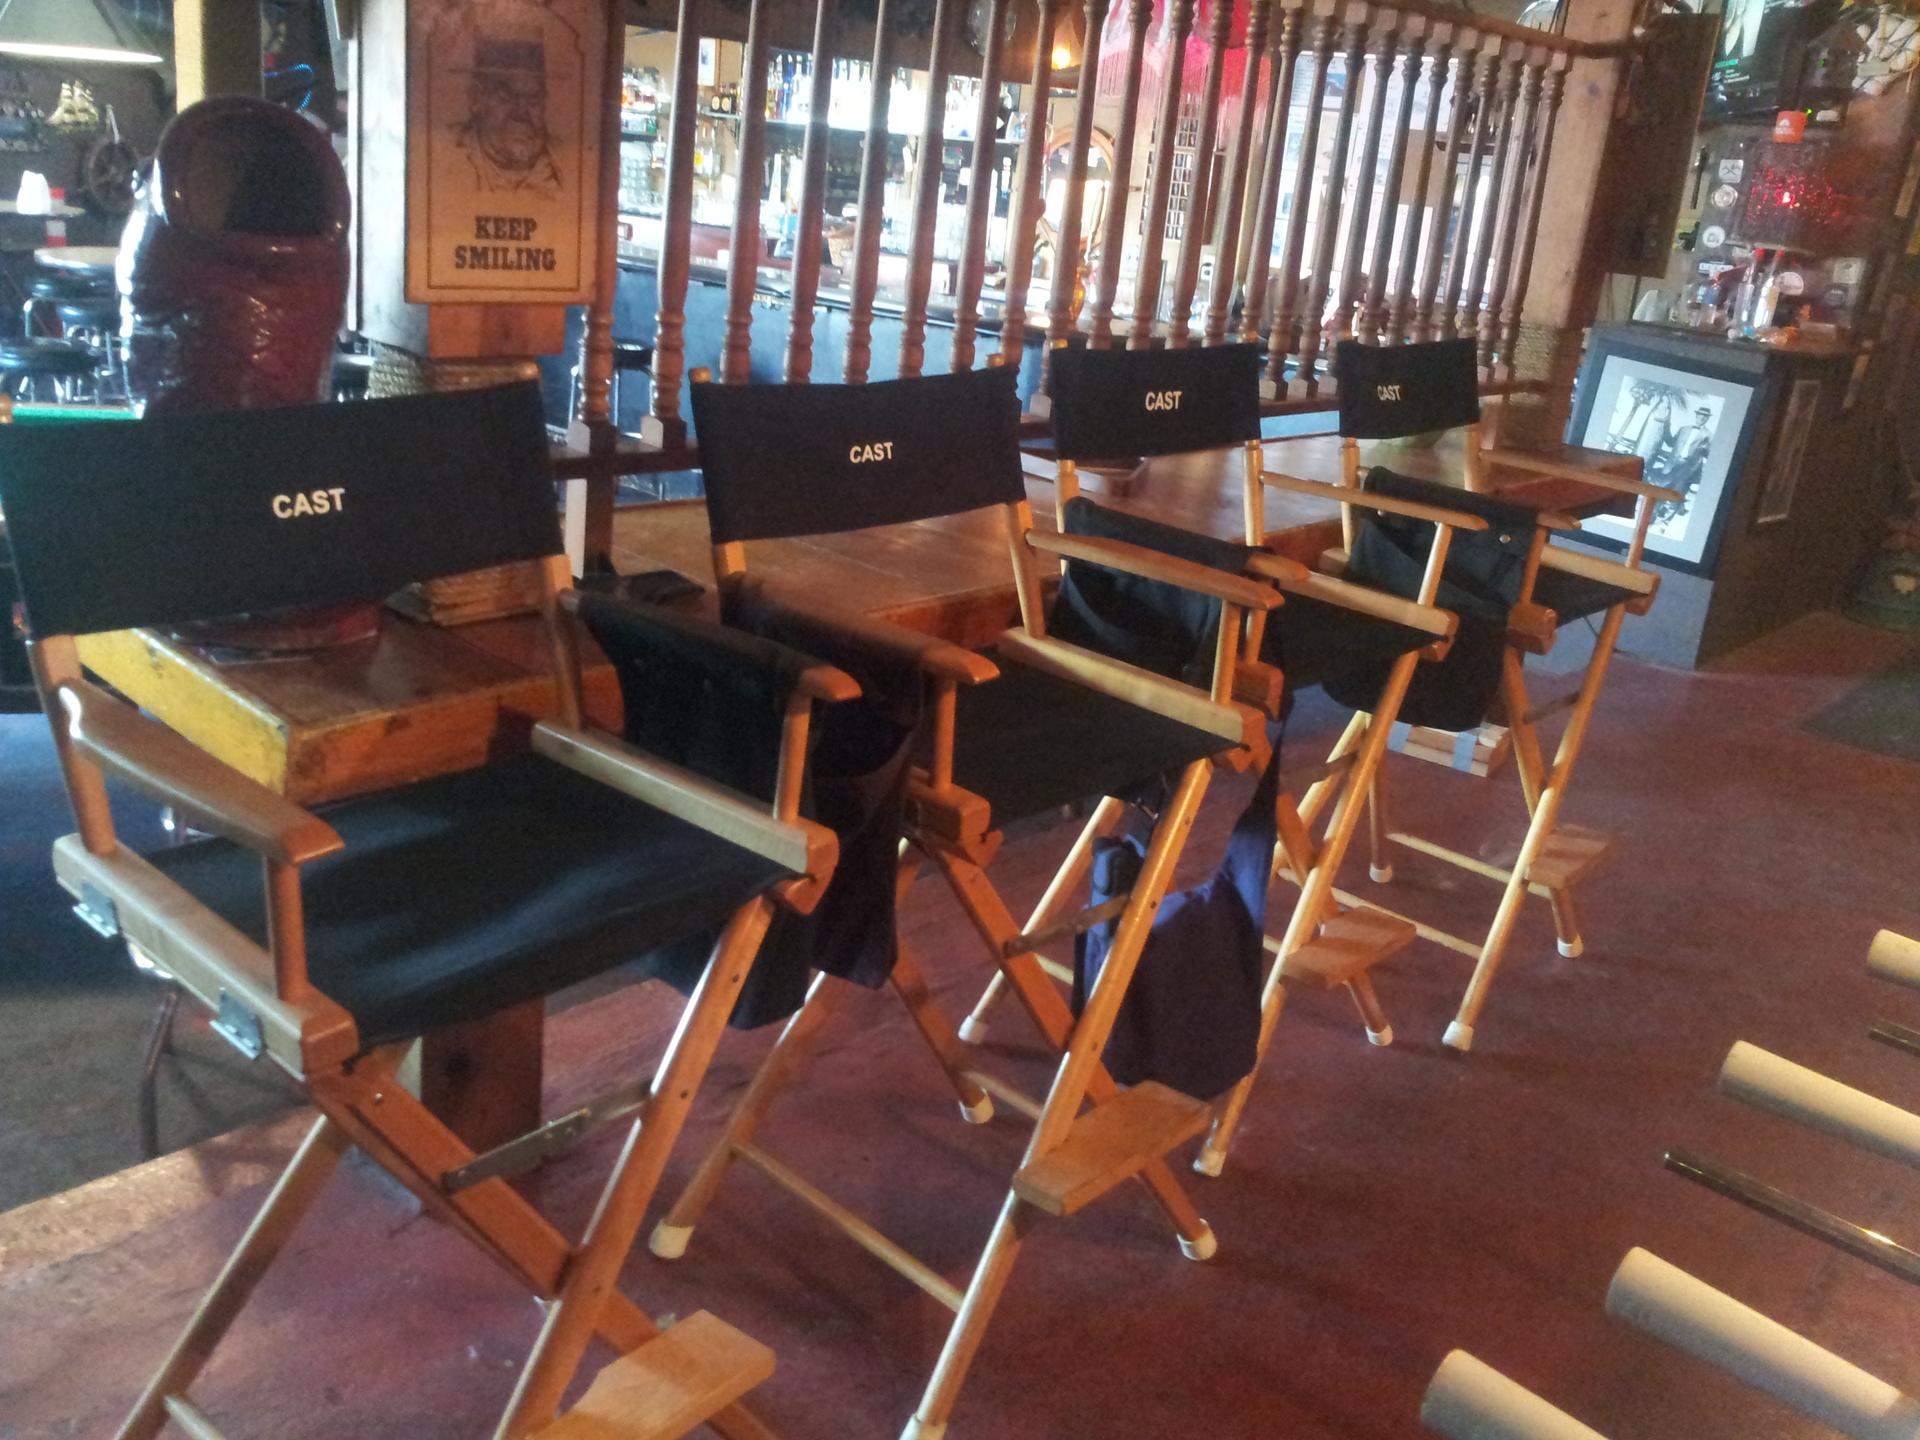 cast seats at a film set. cast seats seup prior to a filming at a local bar.